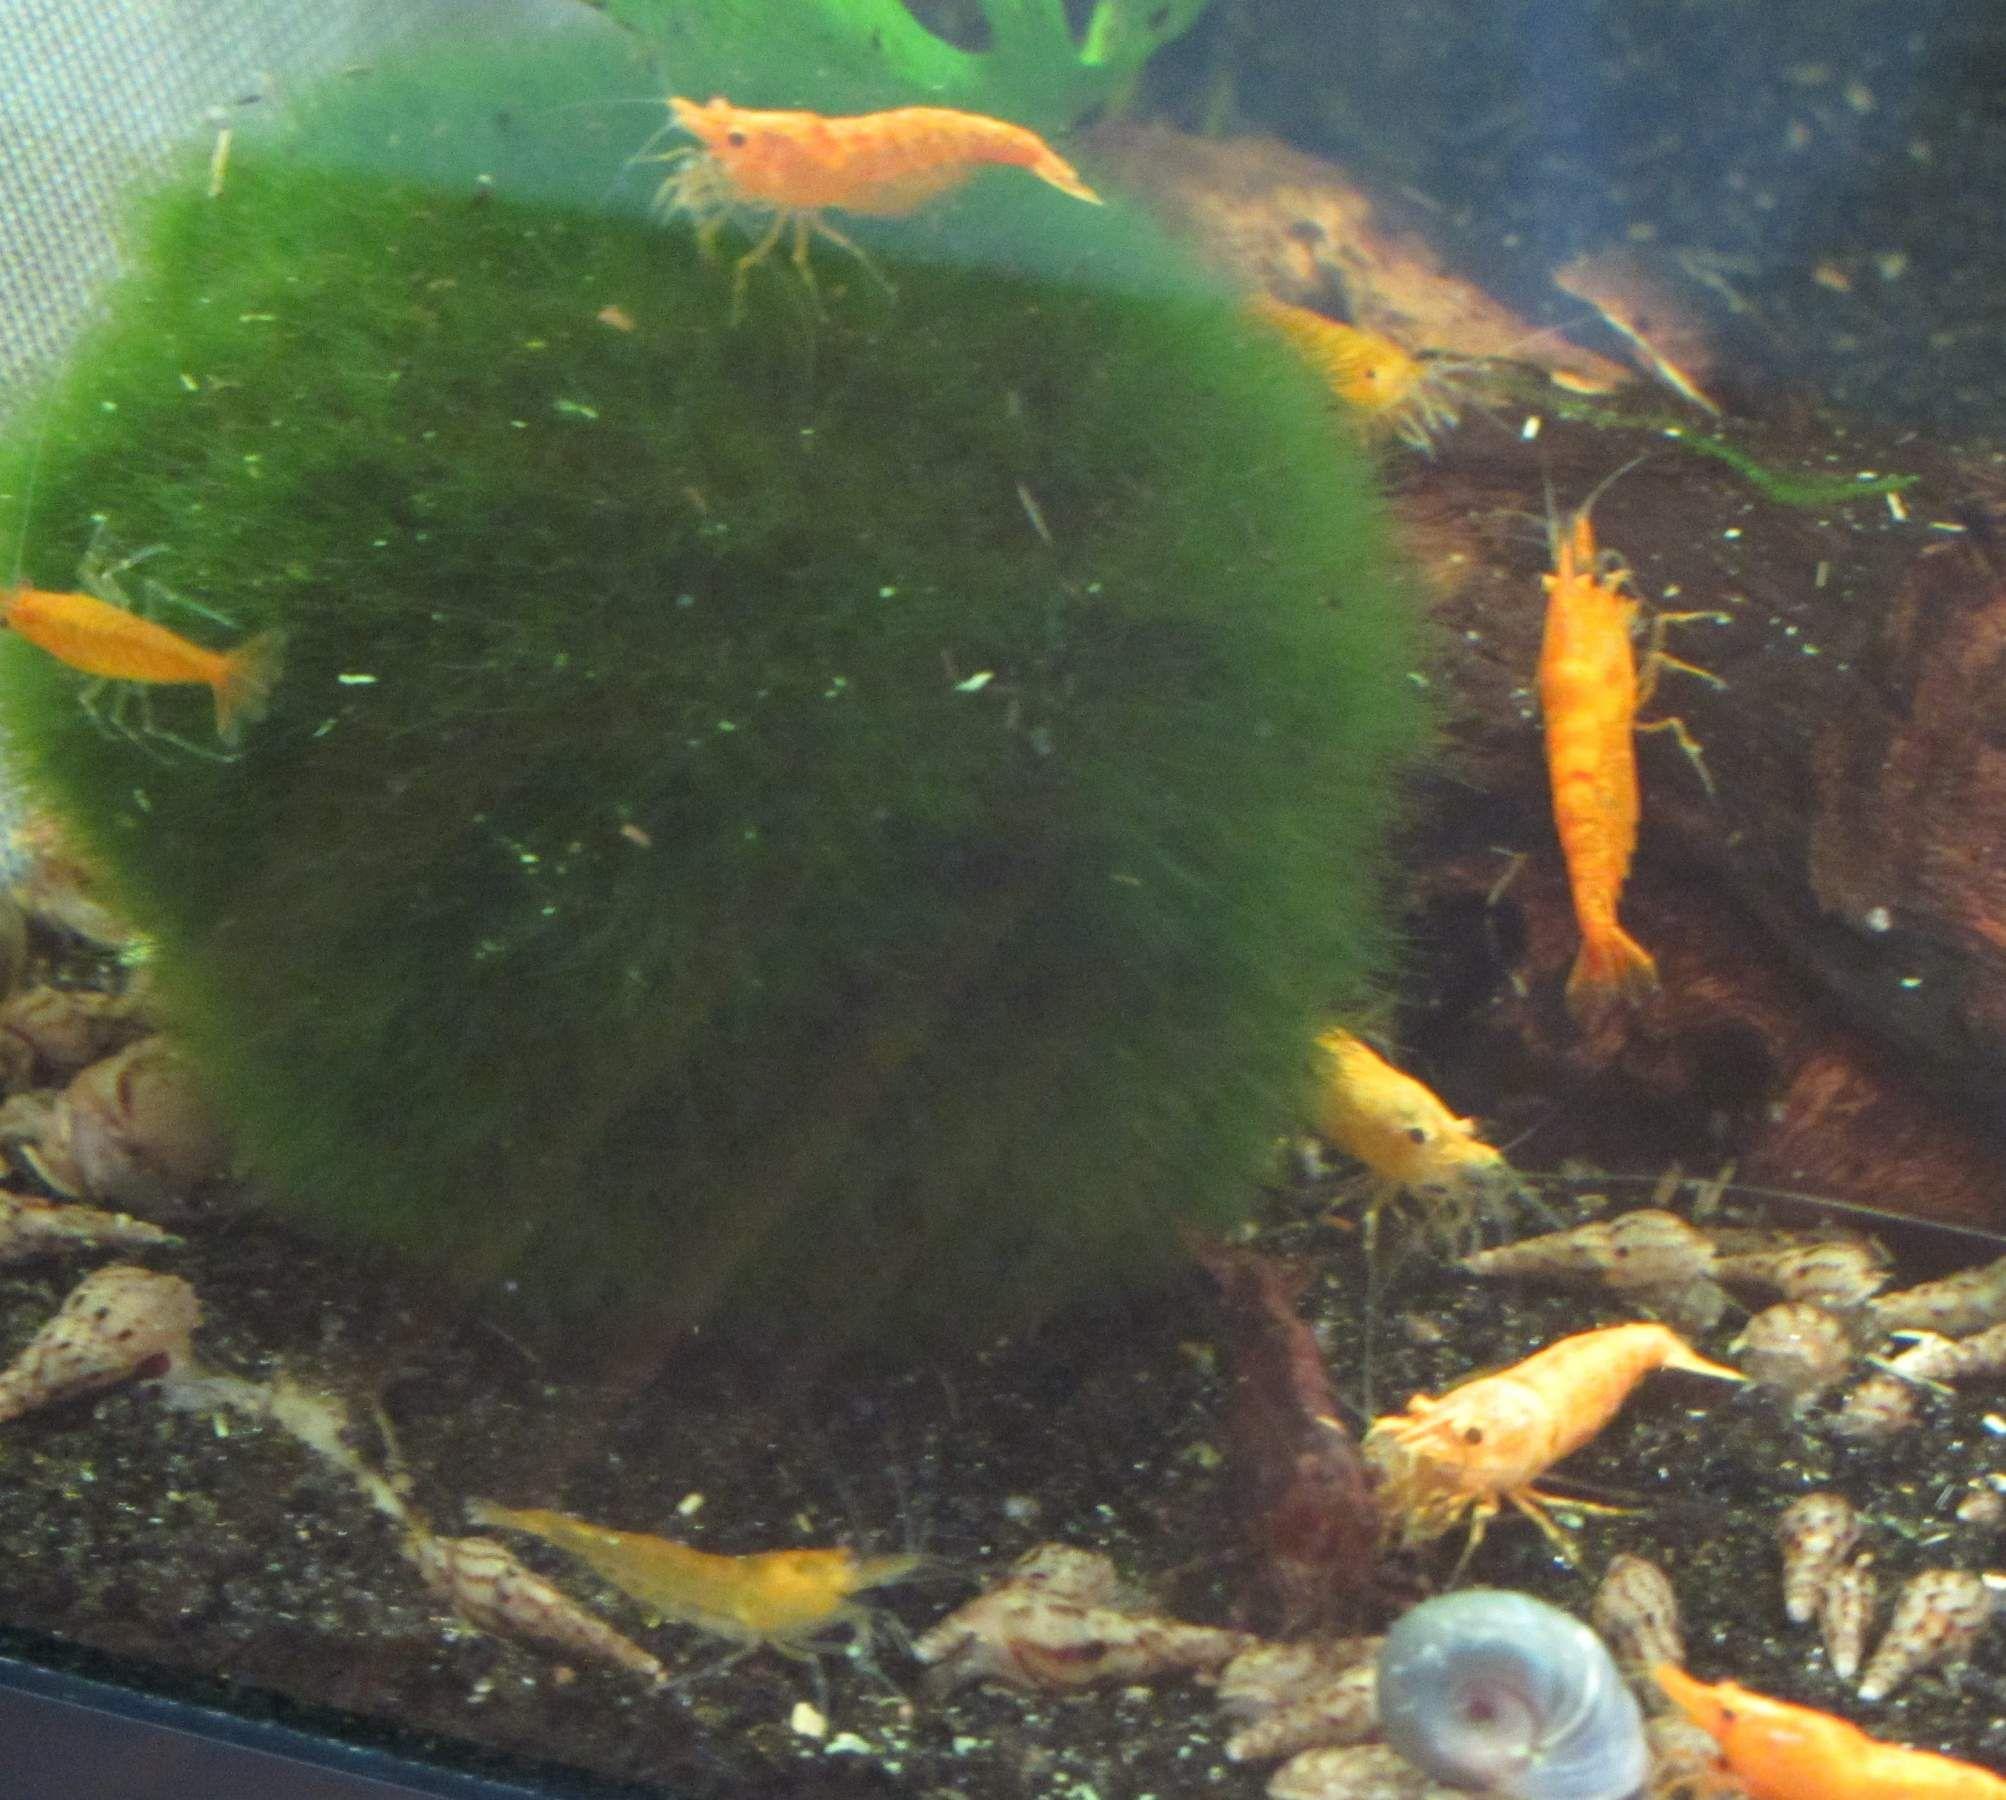 Vegetarian freshwater aquarium fish - Freshwater Snails Freshwater Fish Tankfish